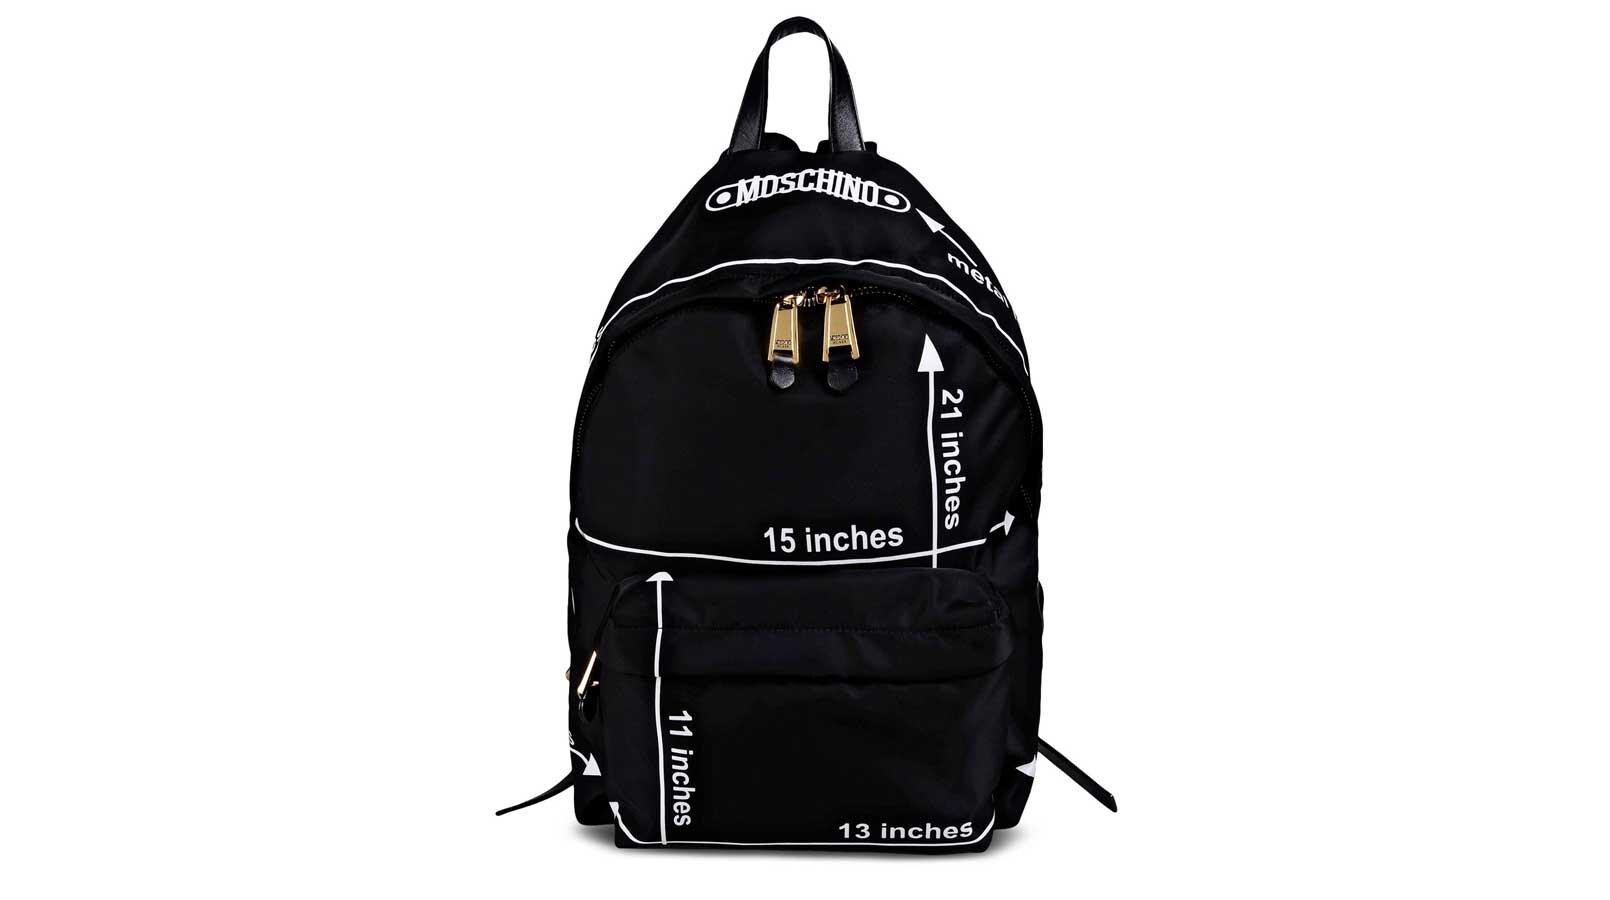 设计包装 - 假日礼物 -  Guid-Guide-MoSchino-Backpack.jpg